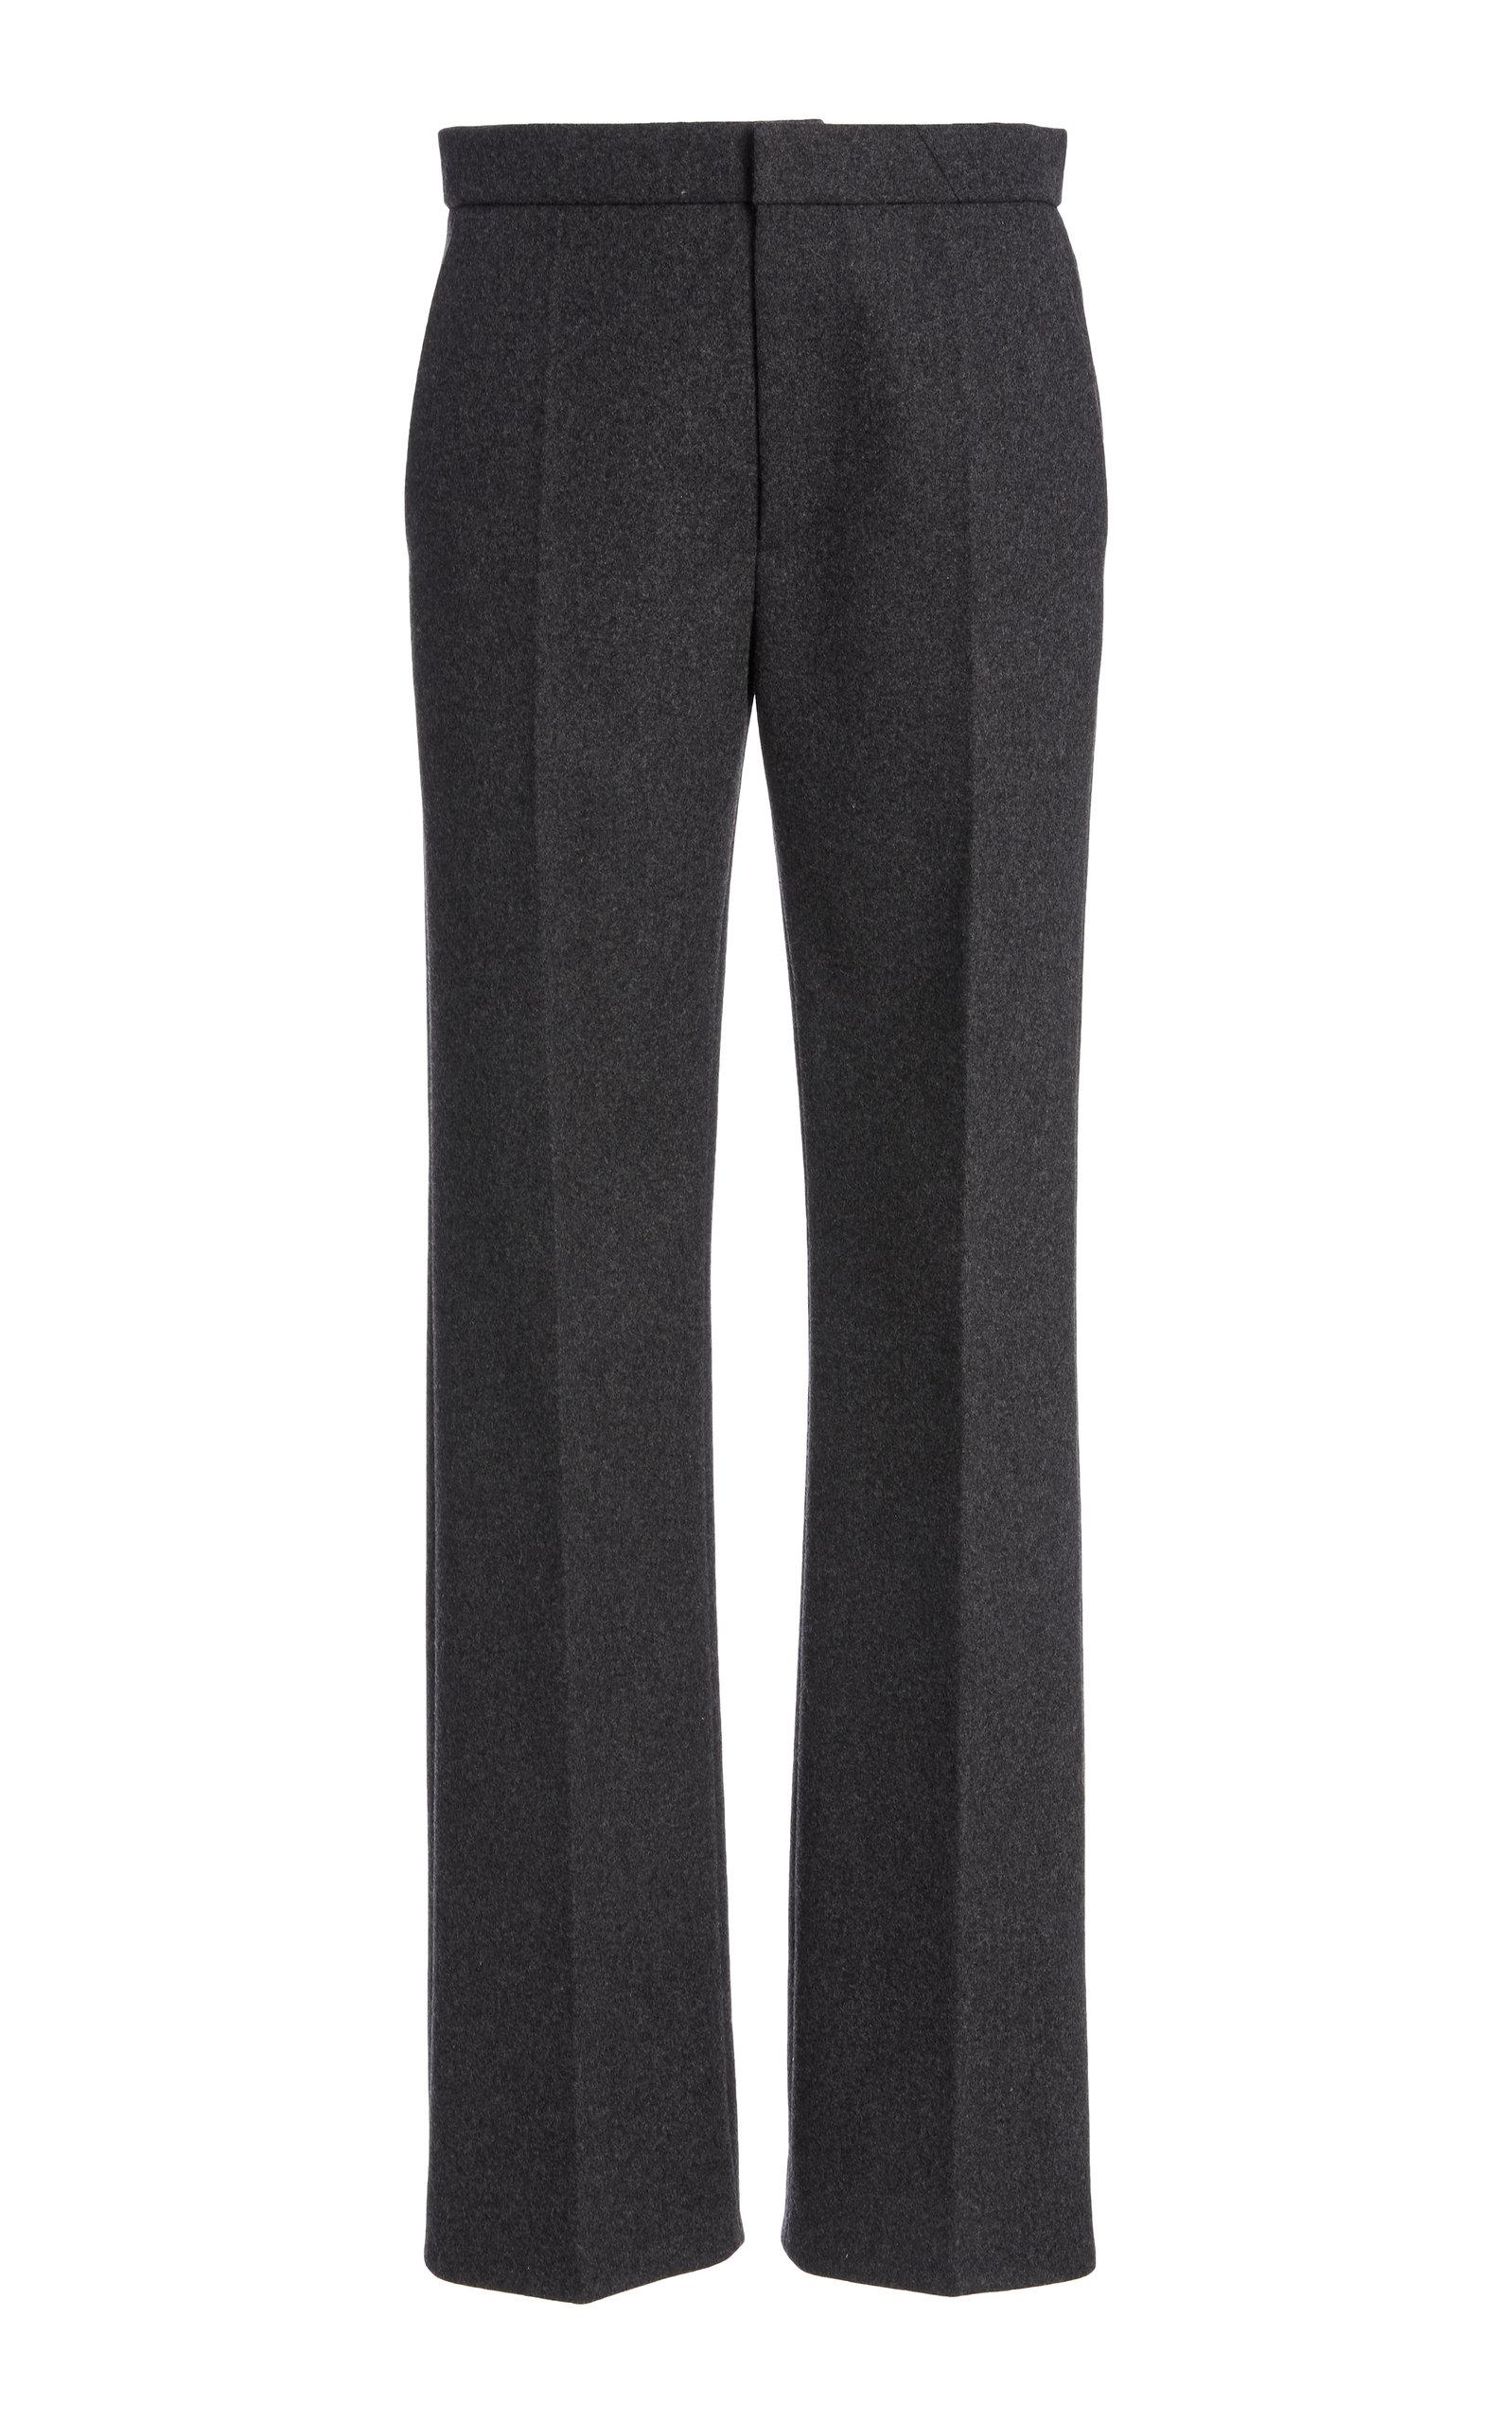 Marc Jacobs РWomen's M̩lange Felt Straight-Leg Pants РGrey РModa Operandi